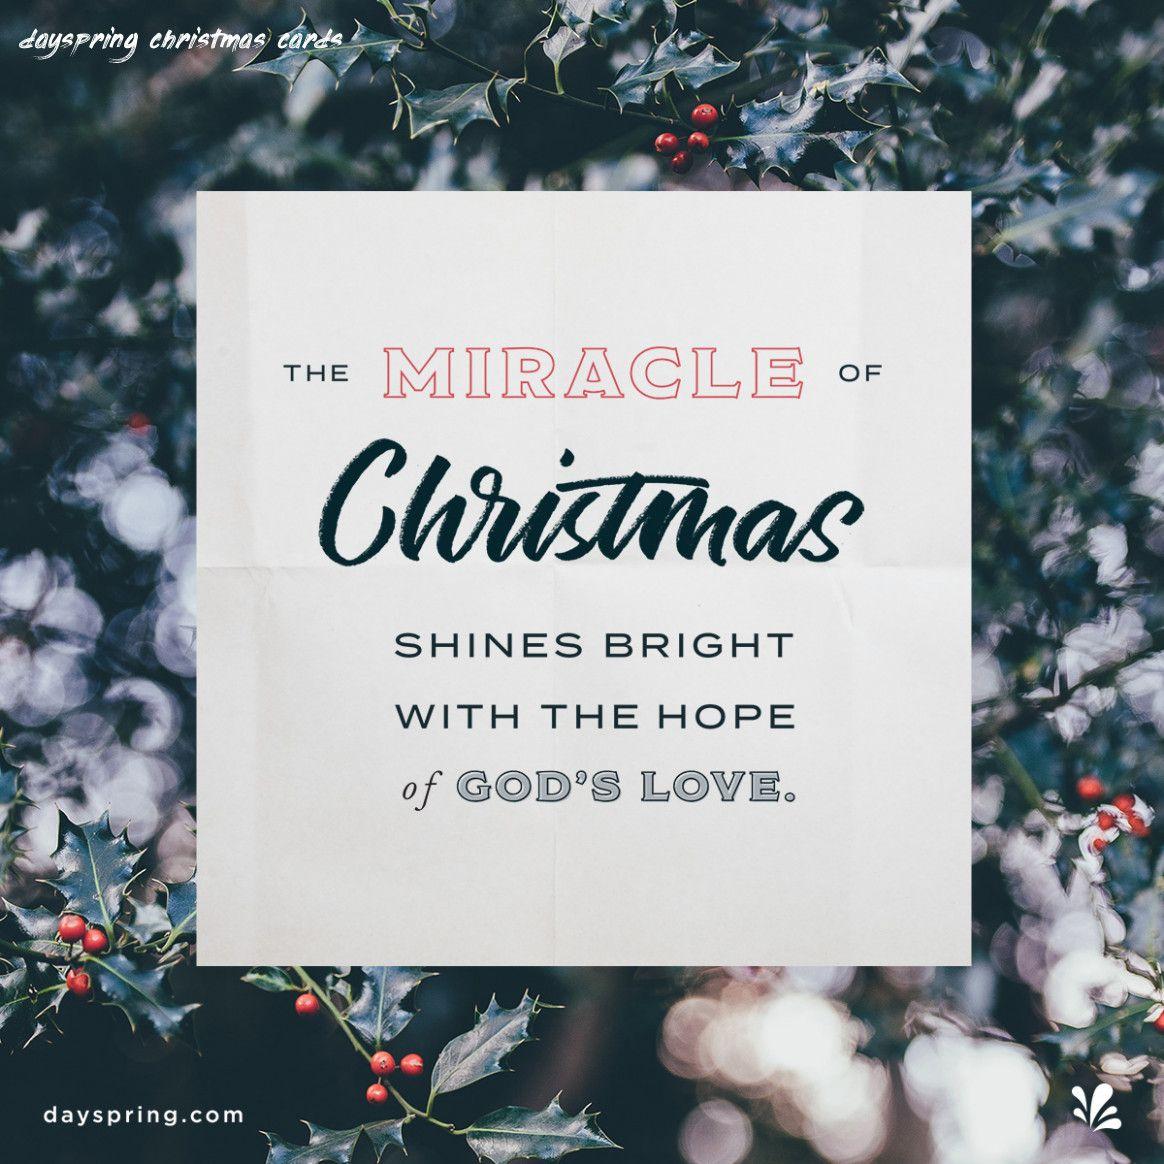 Dayspring Christmas Cards 2020 10 Dayspring Christmas Cards in 2020 | Dayspring, Ecards